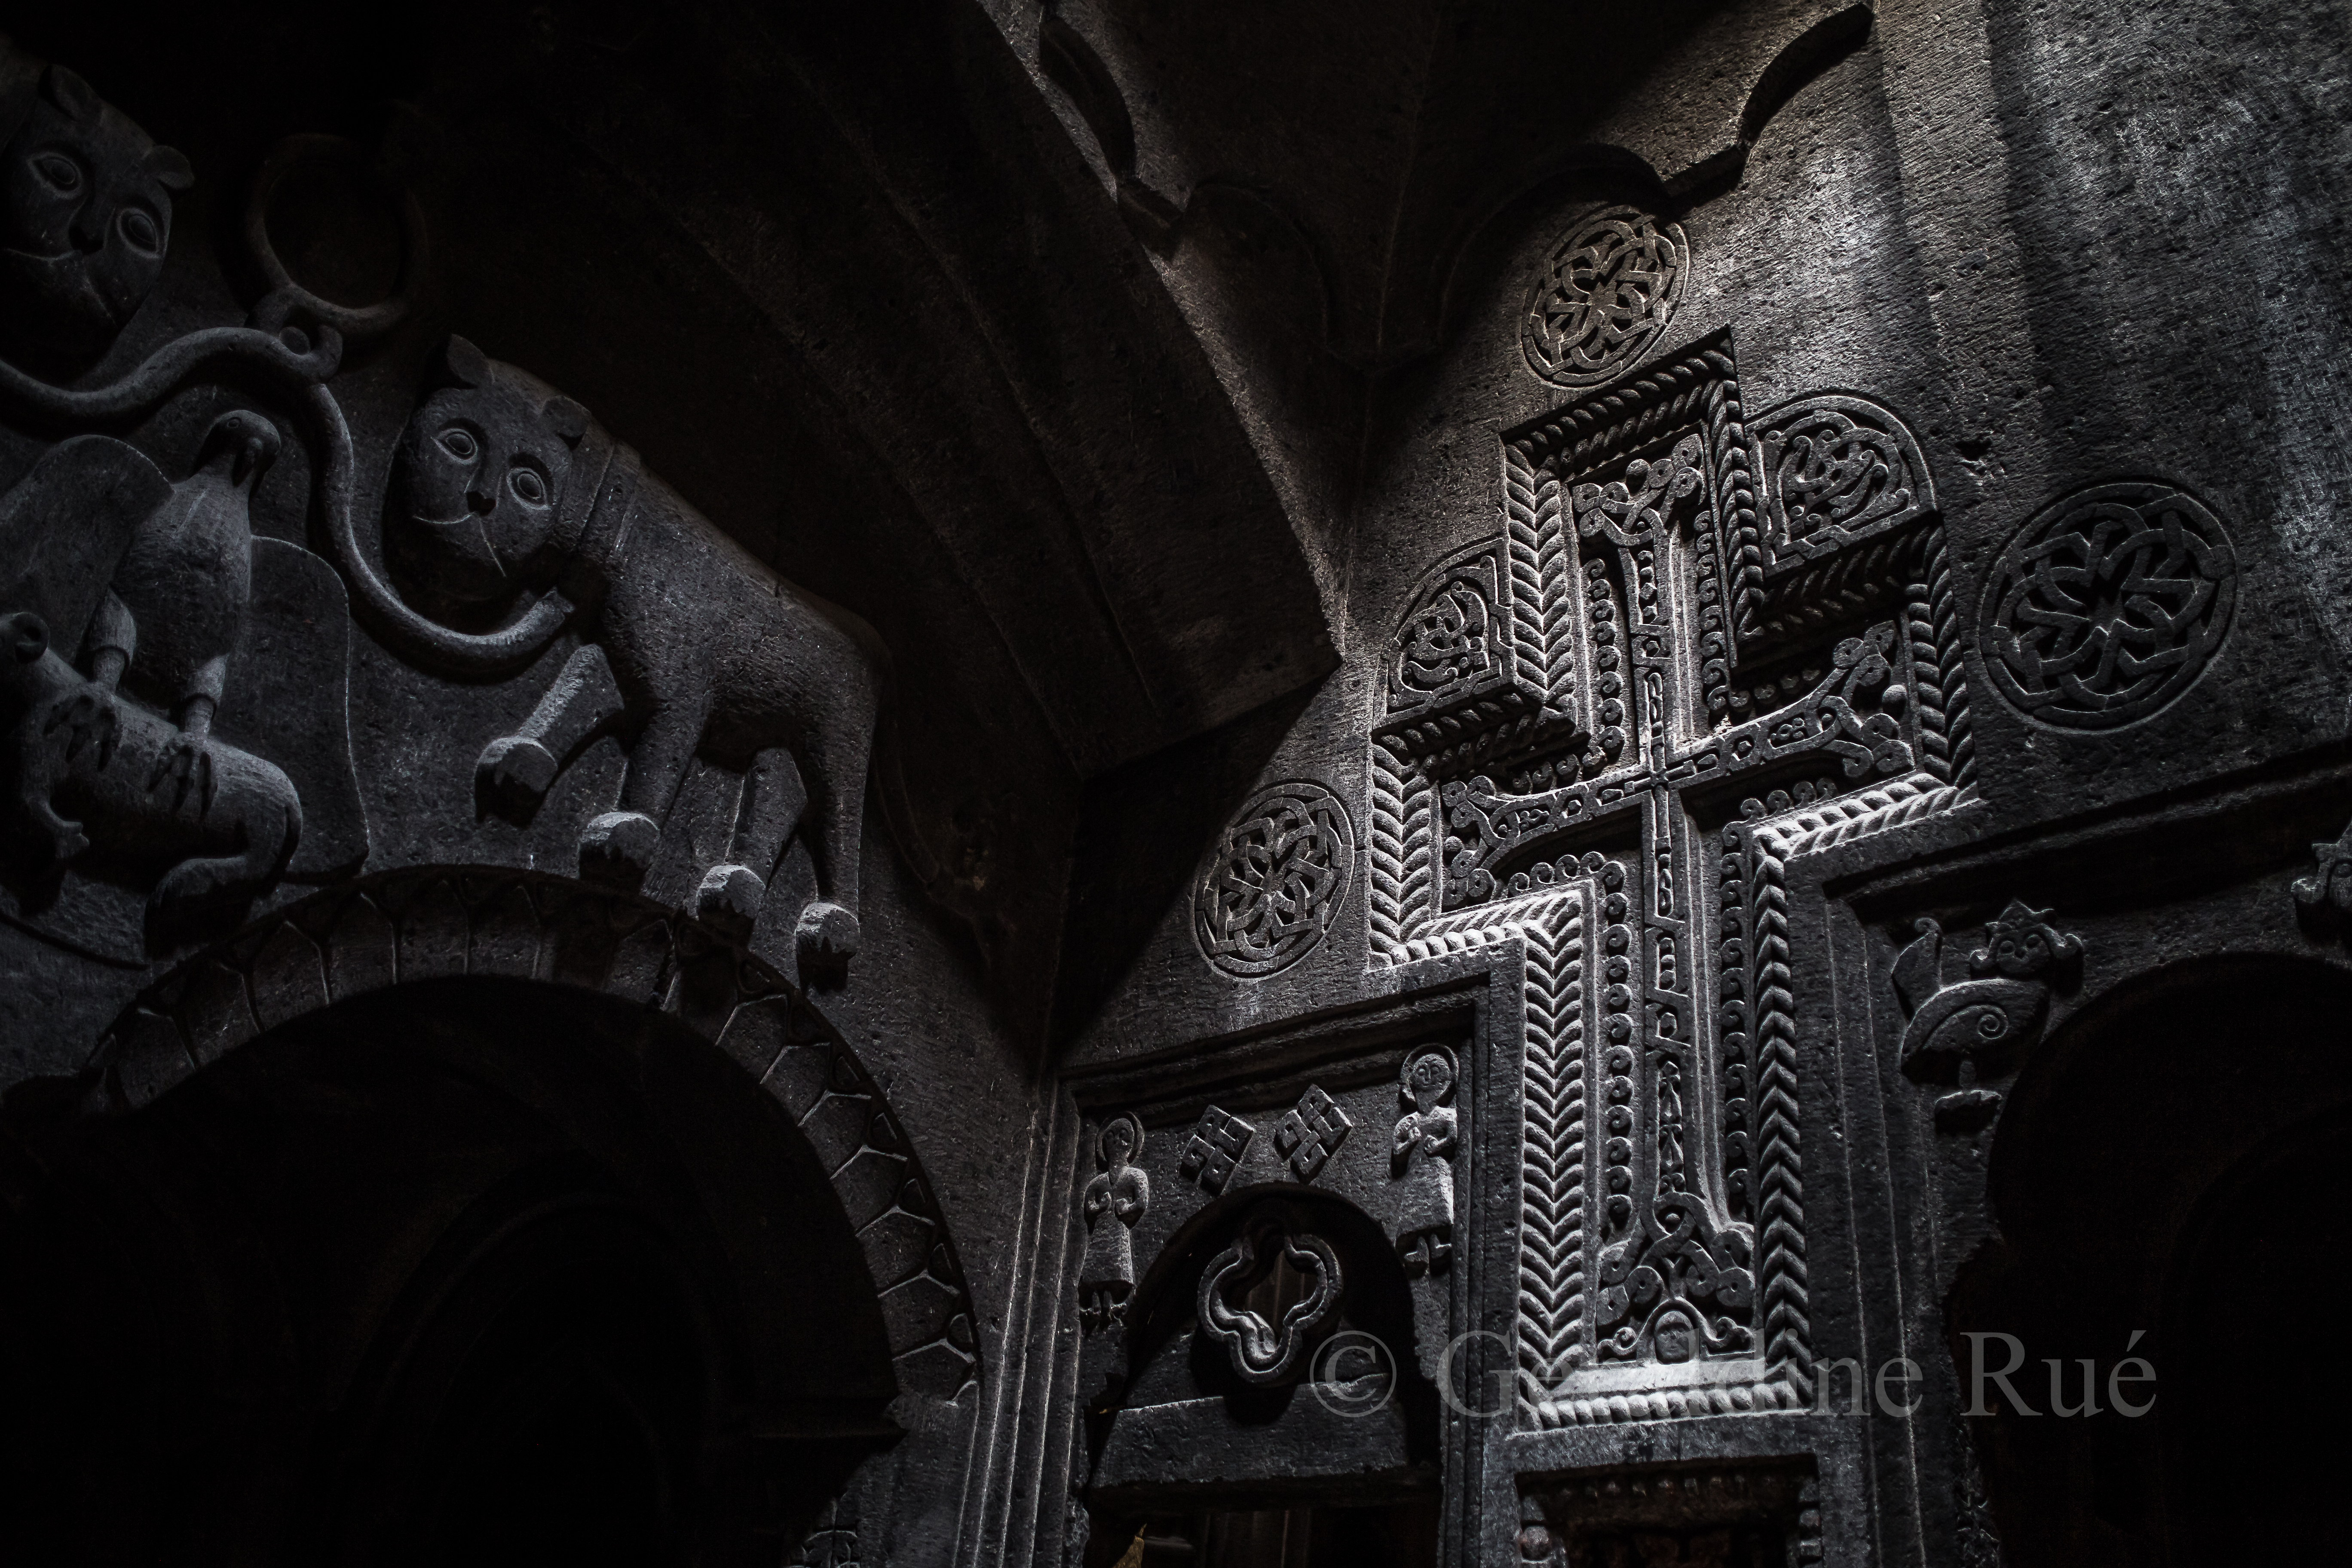 Arménie-Géorgie174314© Géraldine Rué